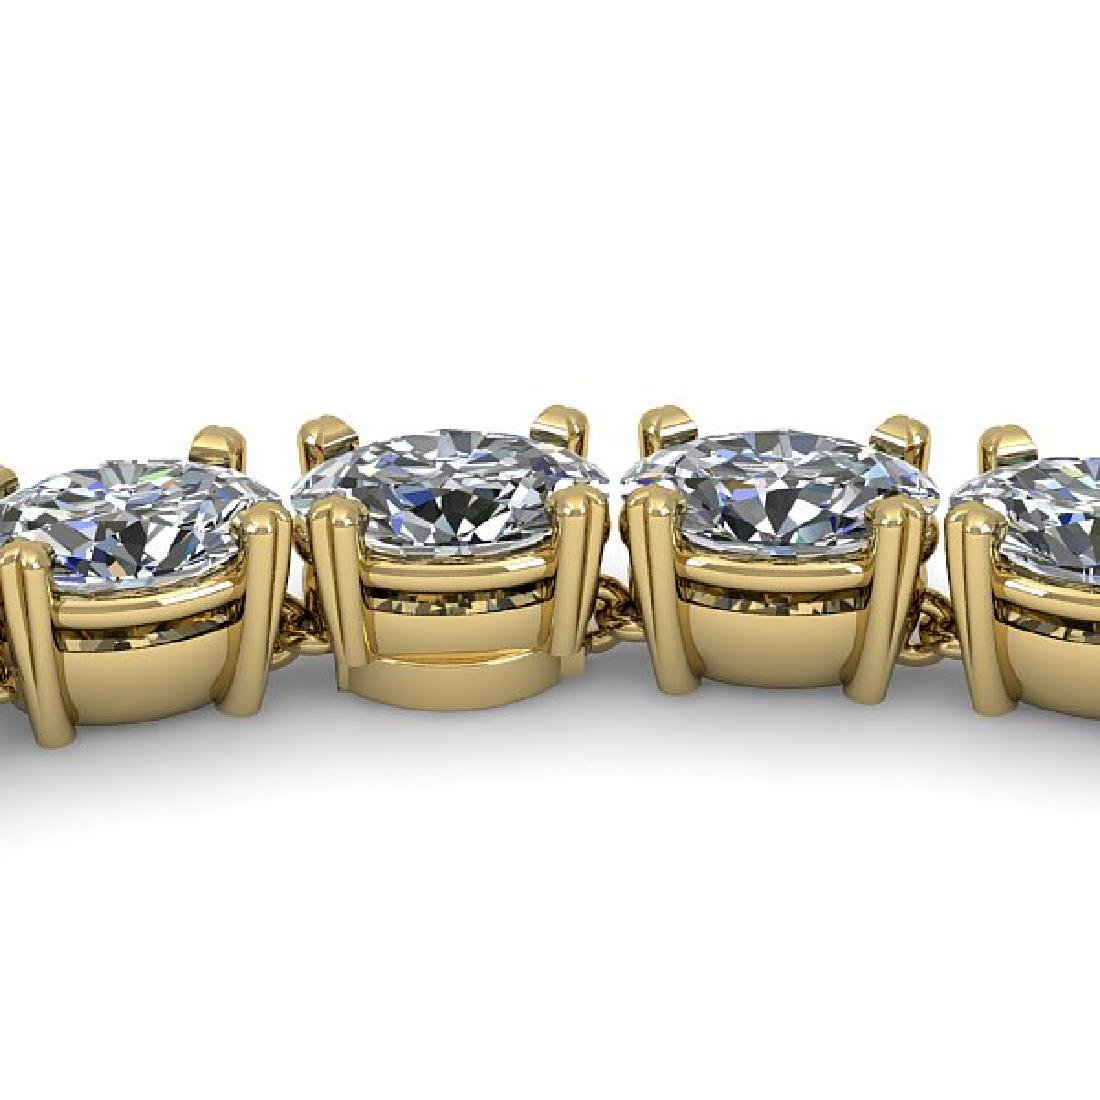 26 CTW Oval Cut Certified SI Diamond Necklace 18K